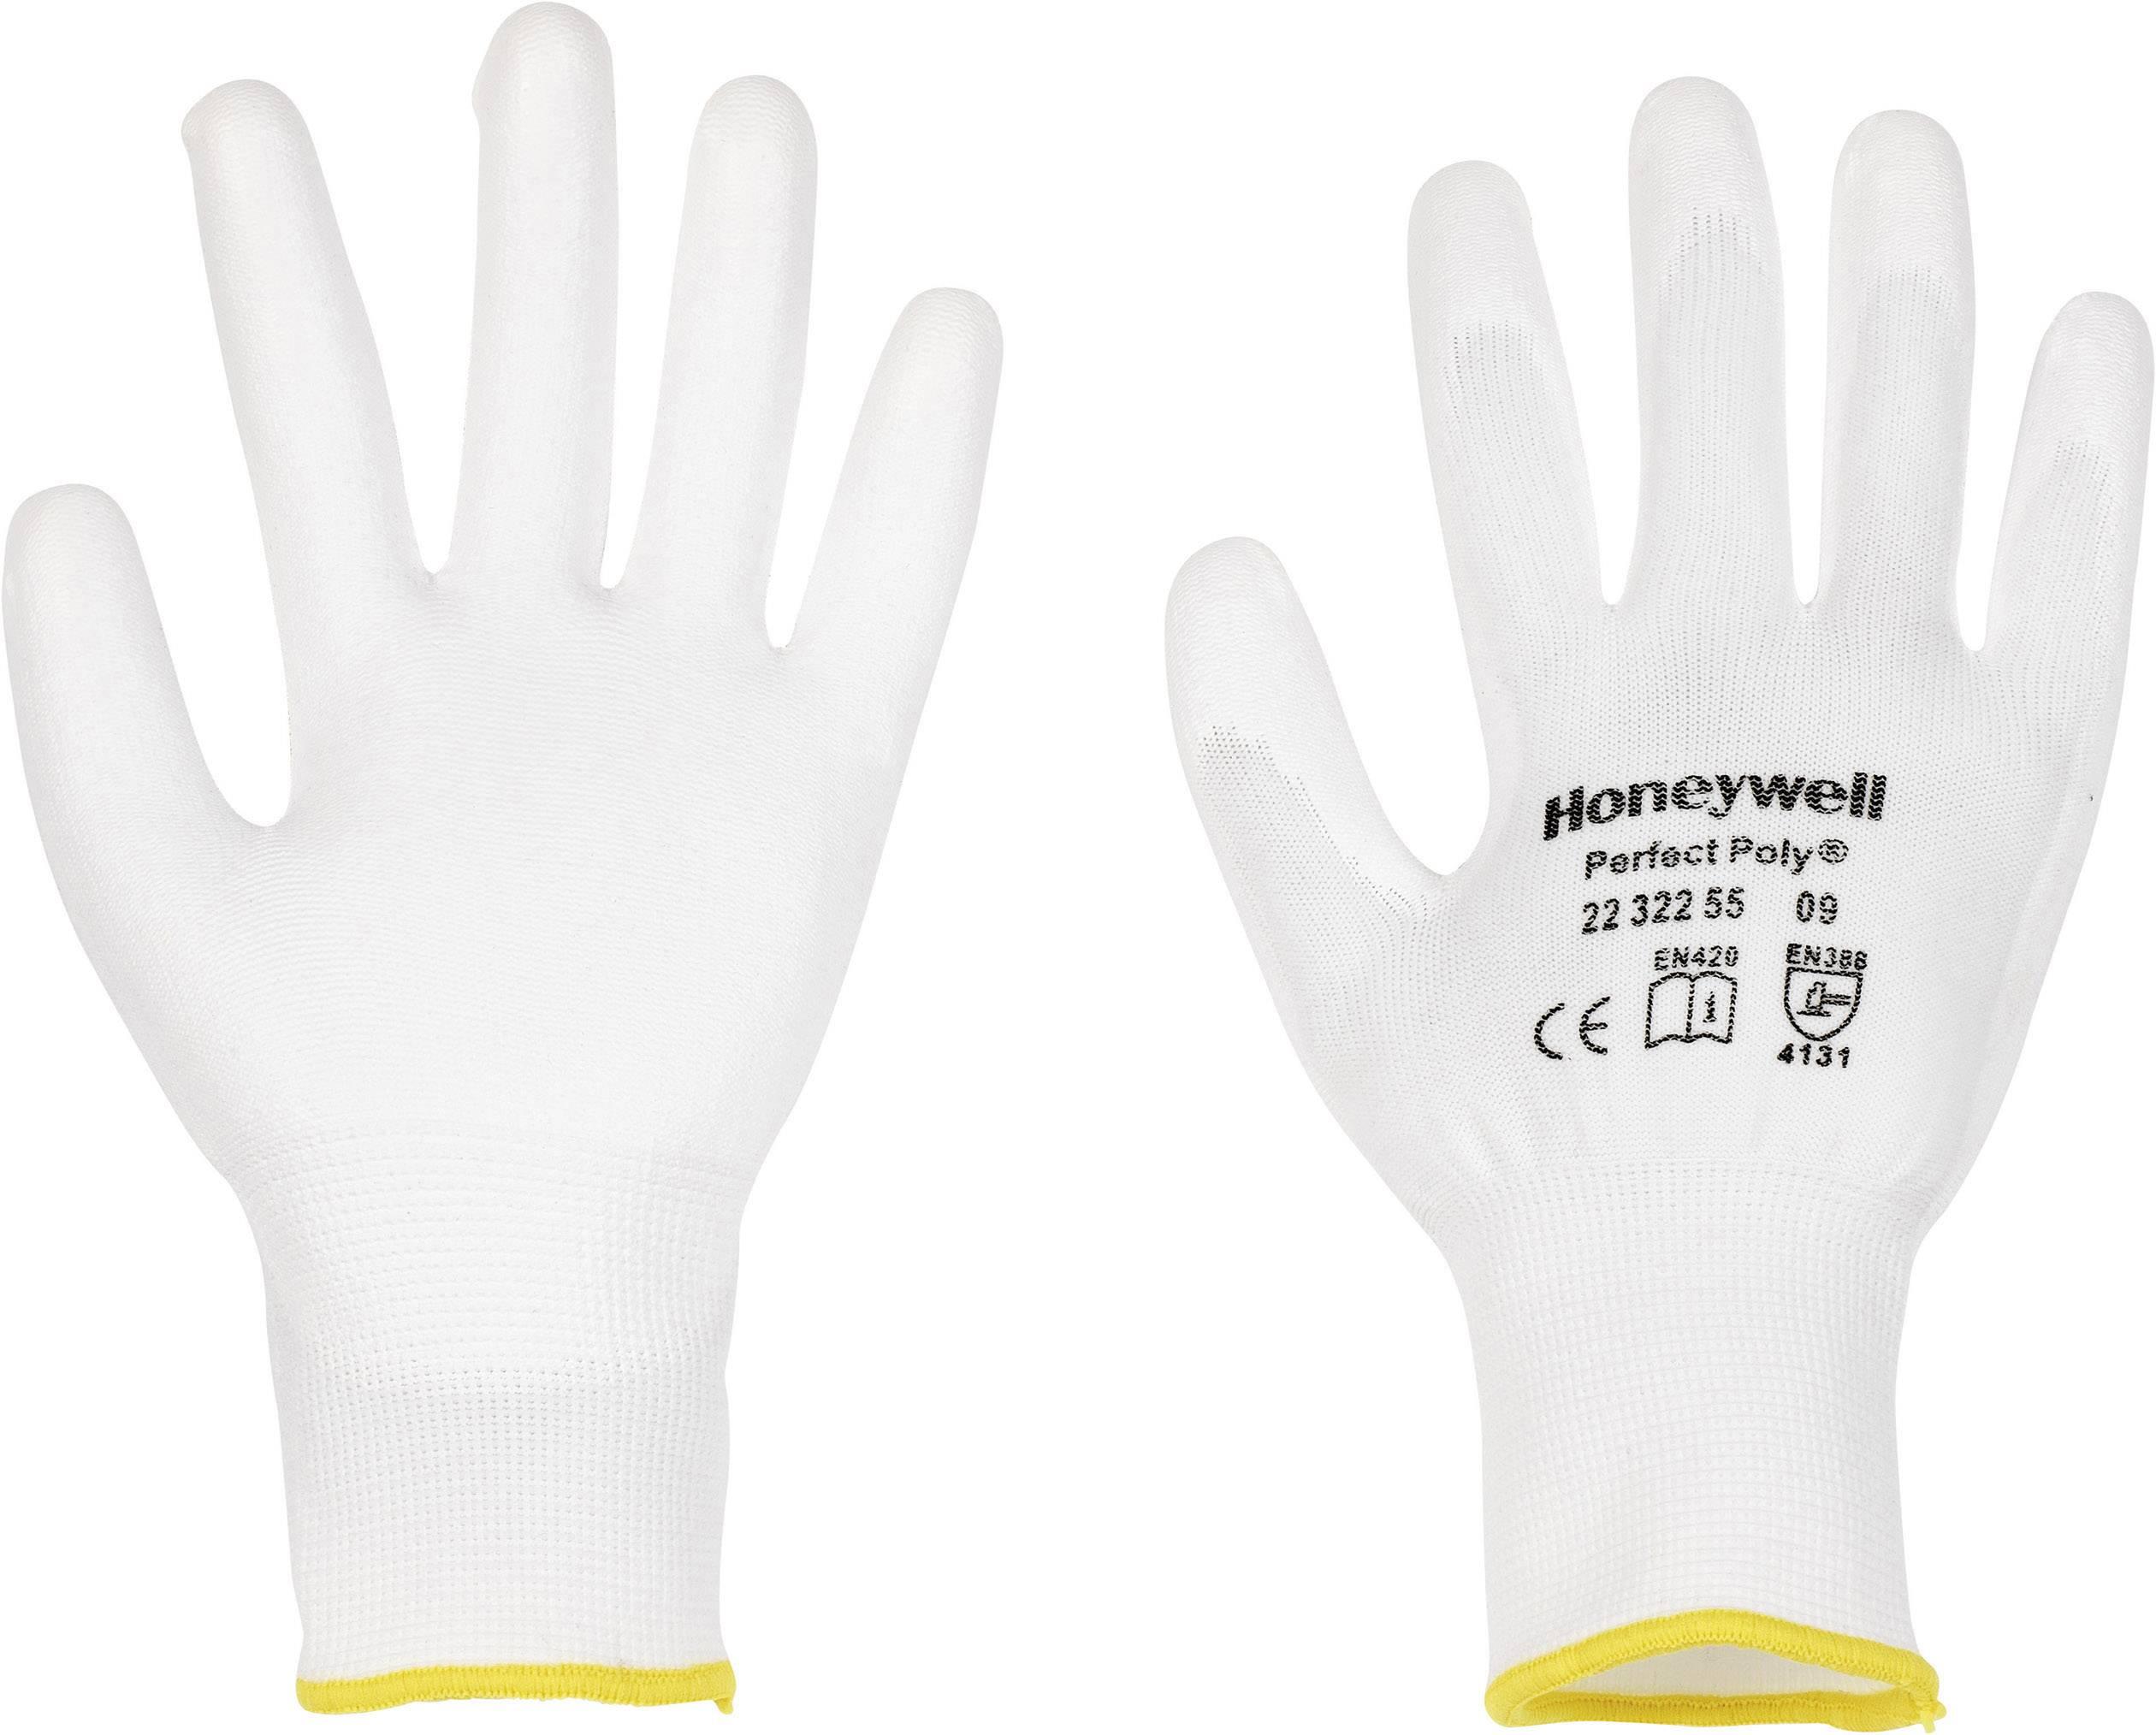 Pracovné rukavice Perfect Fit GANTS BLANCS PERFECTPOLY 2232255, velikost rukavic: 7, S